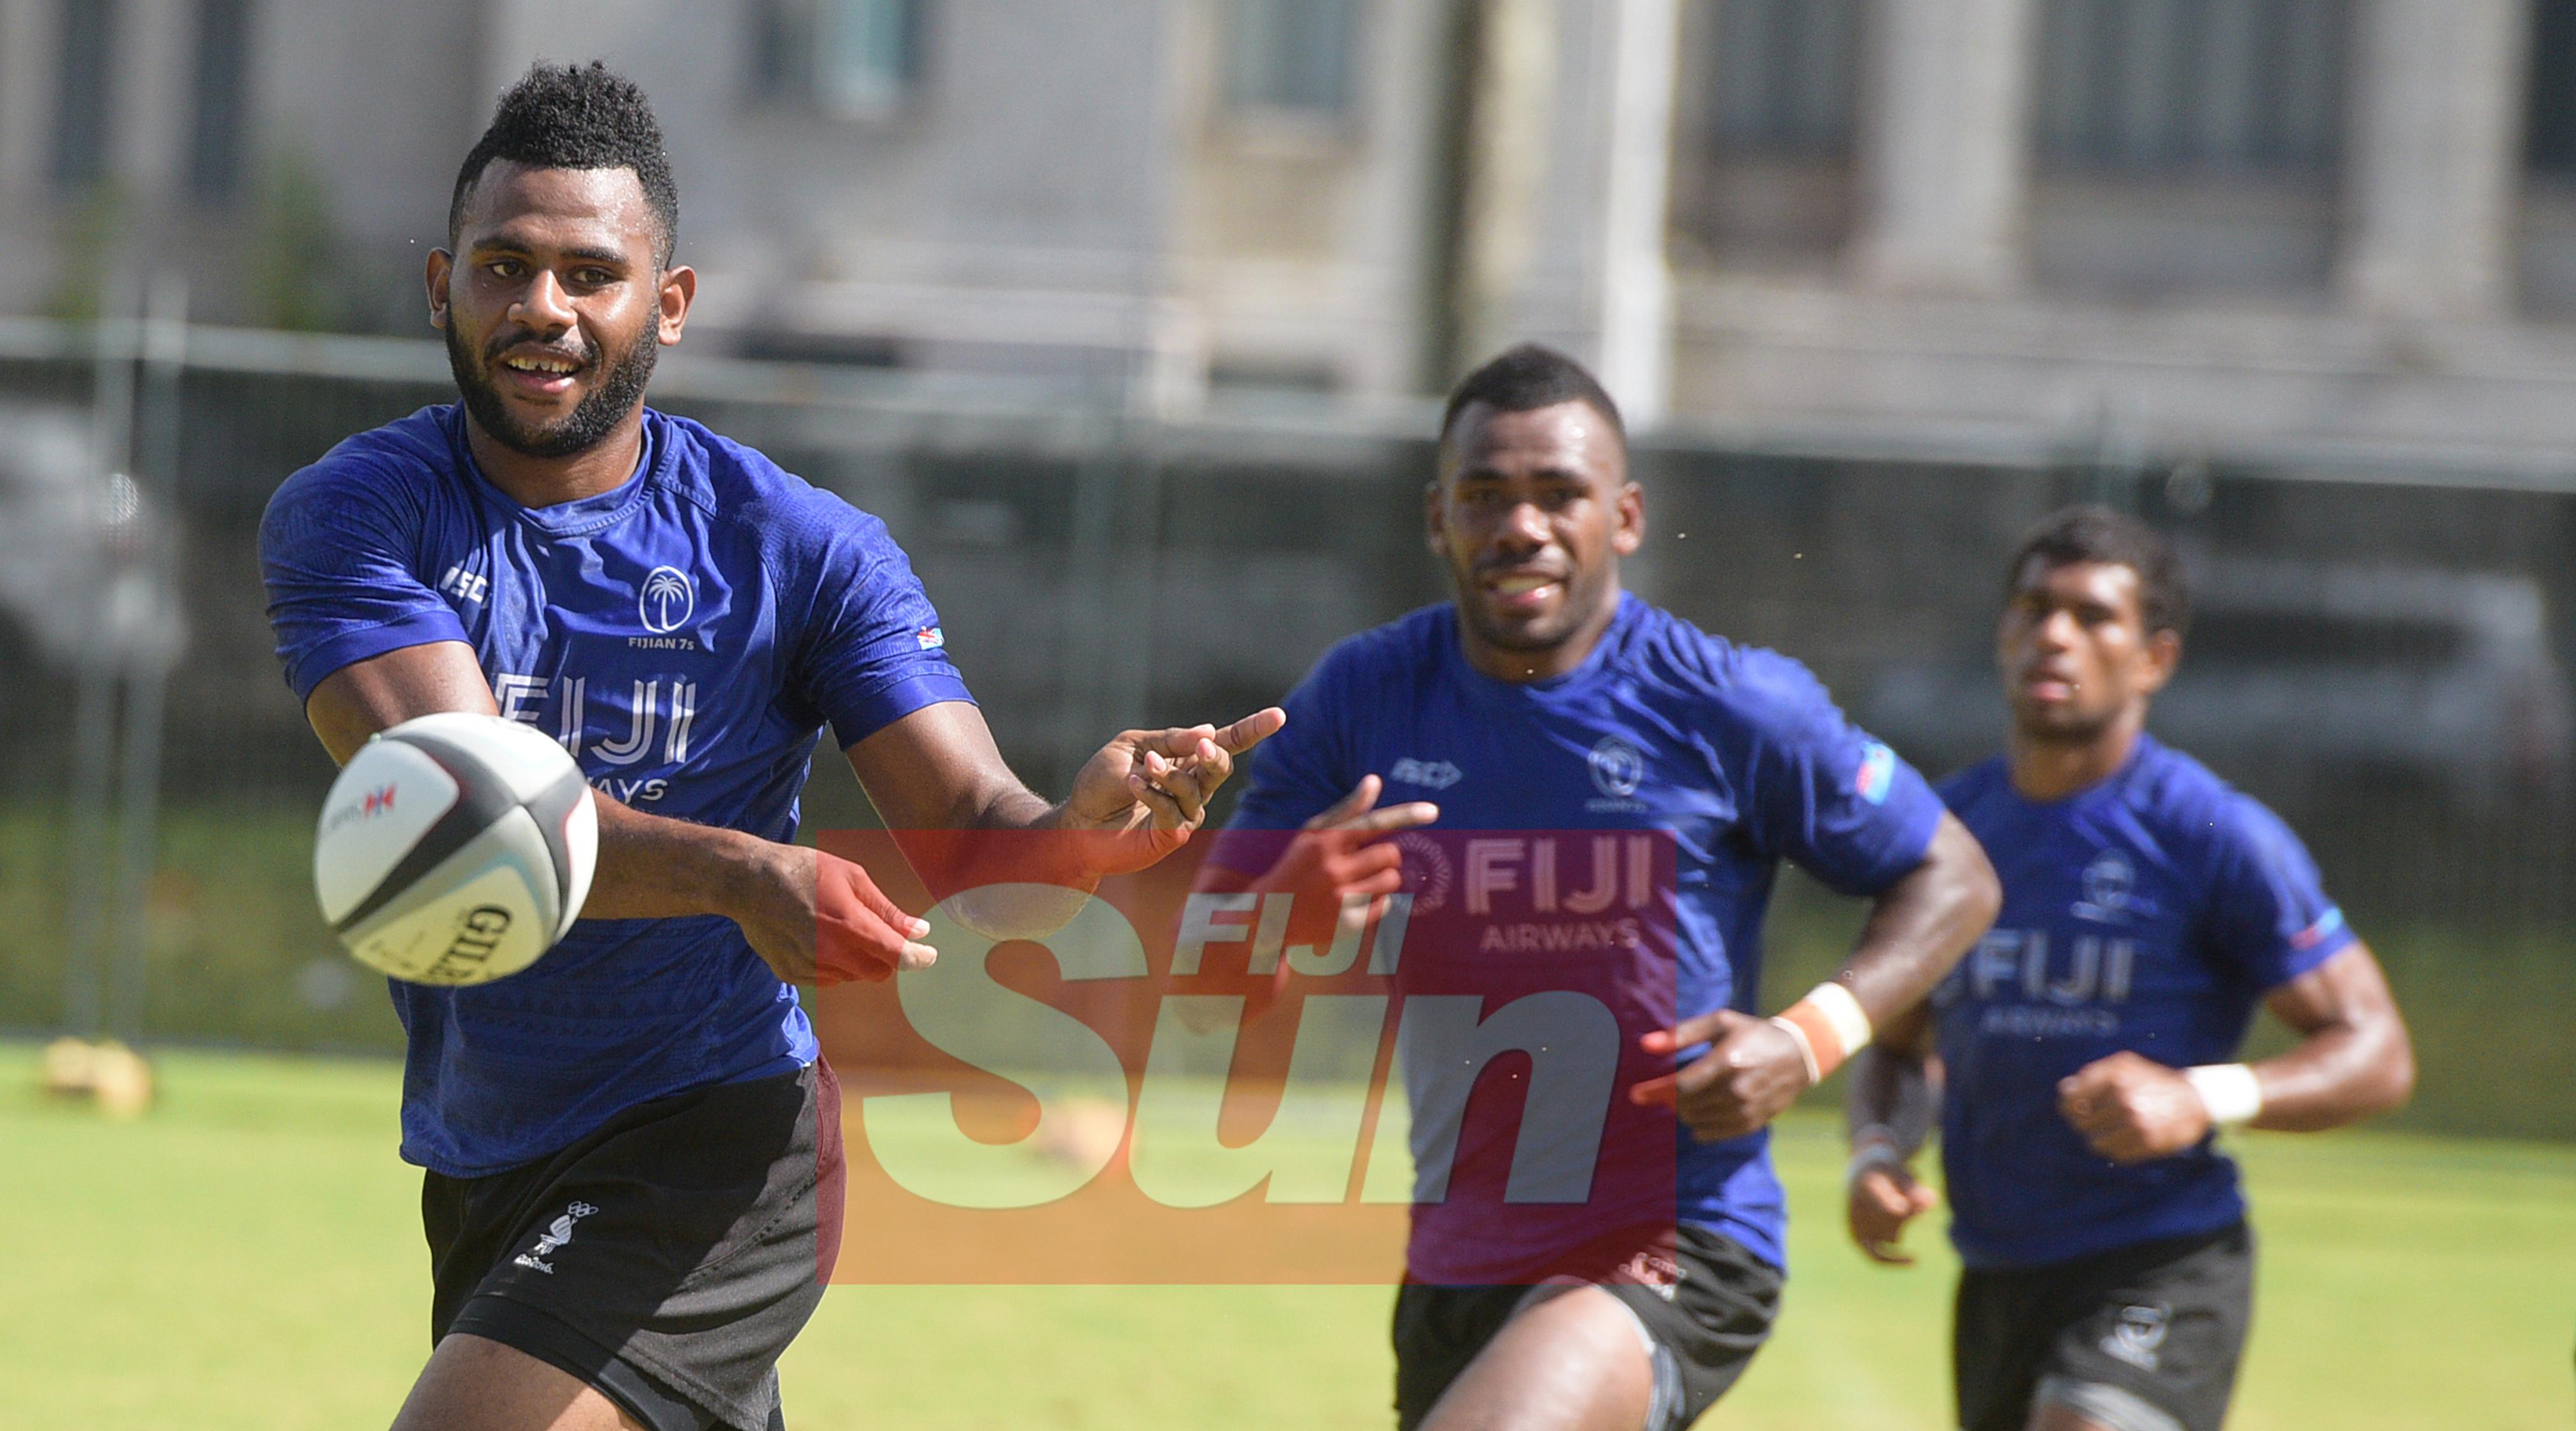 Vilimoni Botitu during Fiji Sevens Captain's run for Oceania Sevens Championship at Albert Park on November 11, 2019. Photo: Ronald Kumar.